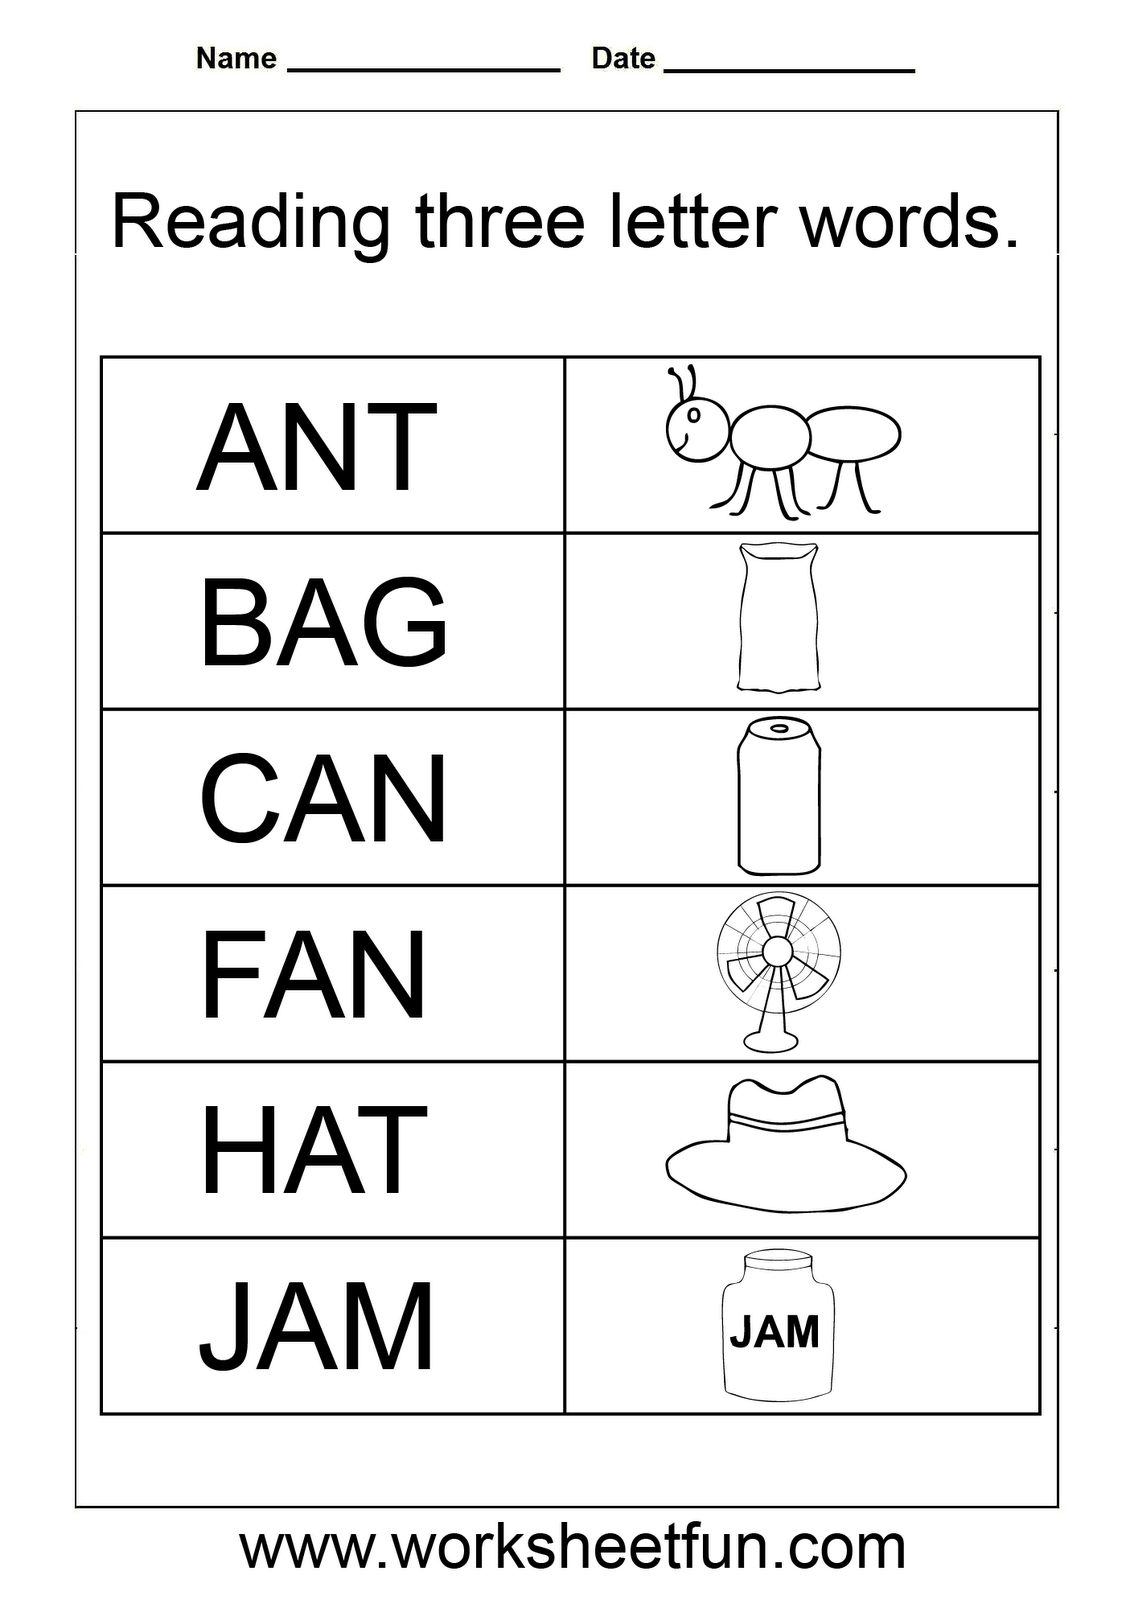 3 Letter Words Worksheets For Kindergarten | Three Letter